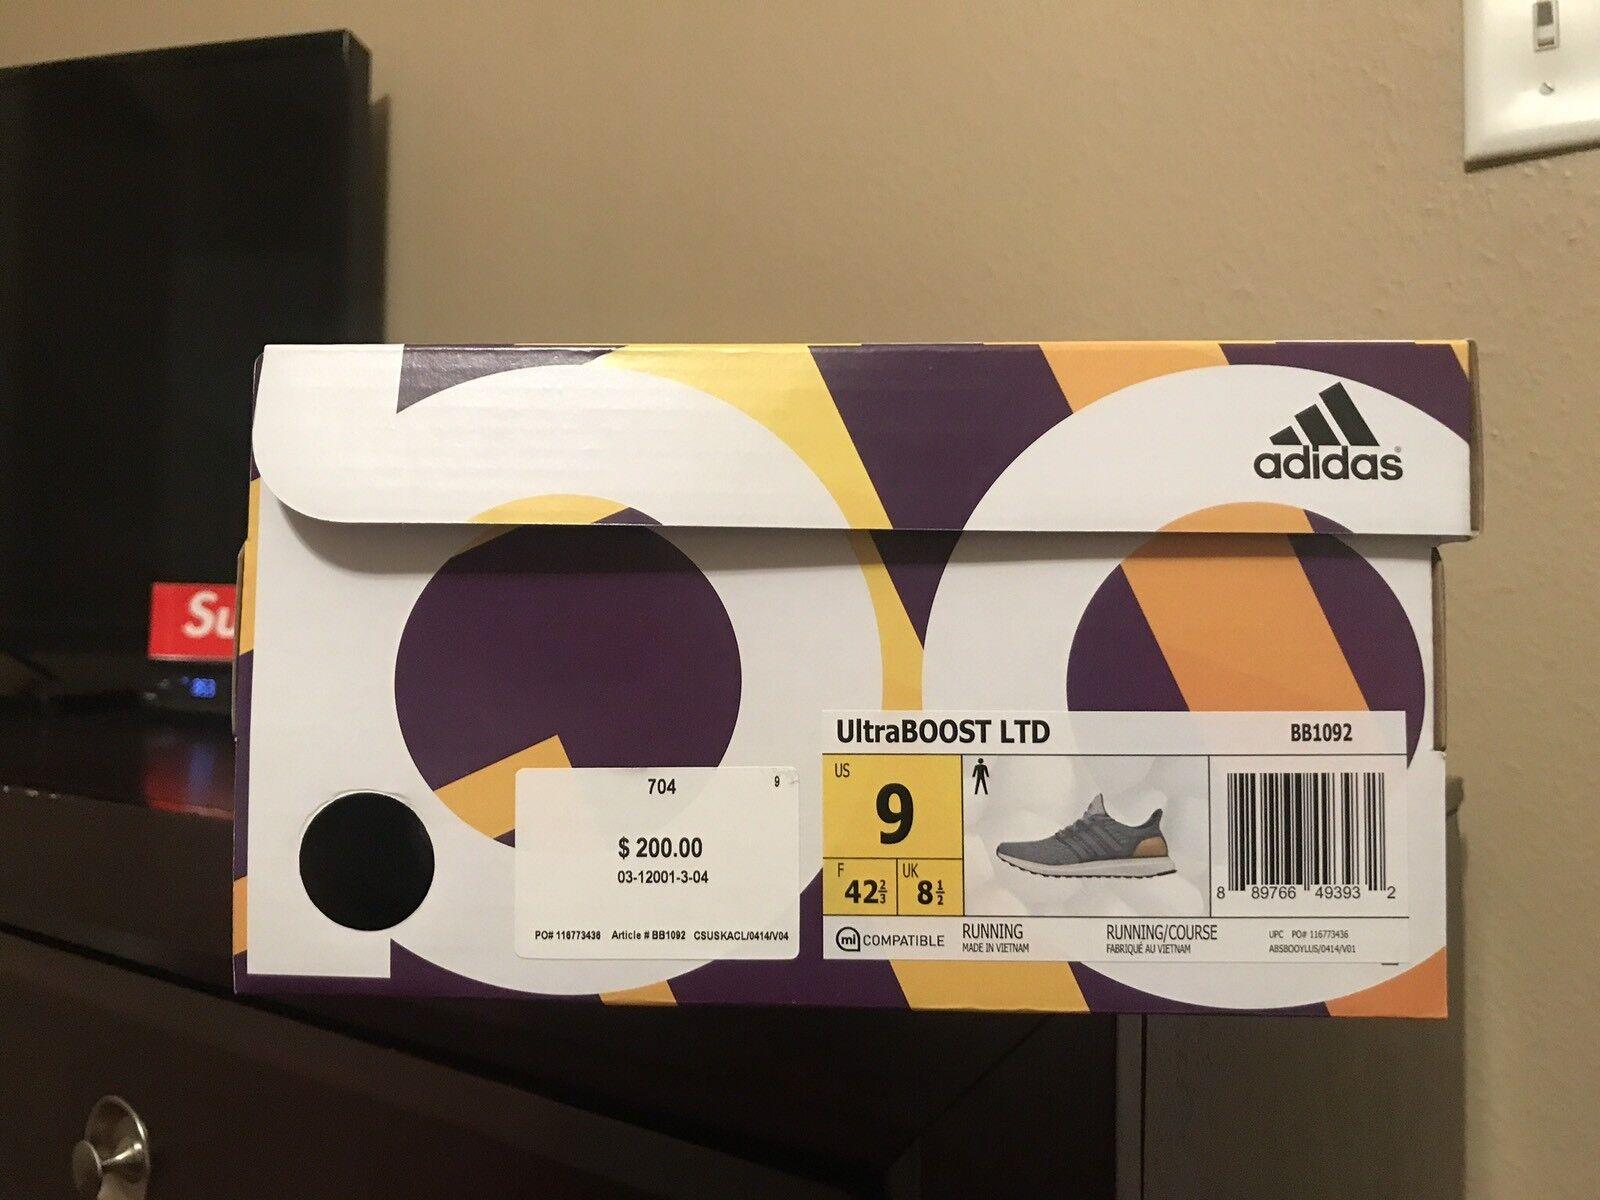 Ds adidas ultra auftrieb leder käfig / 3.0 bb1092 sz-9 w / käfig eingang oreo - tb - creme f5e13d